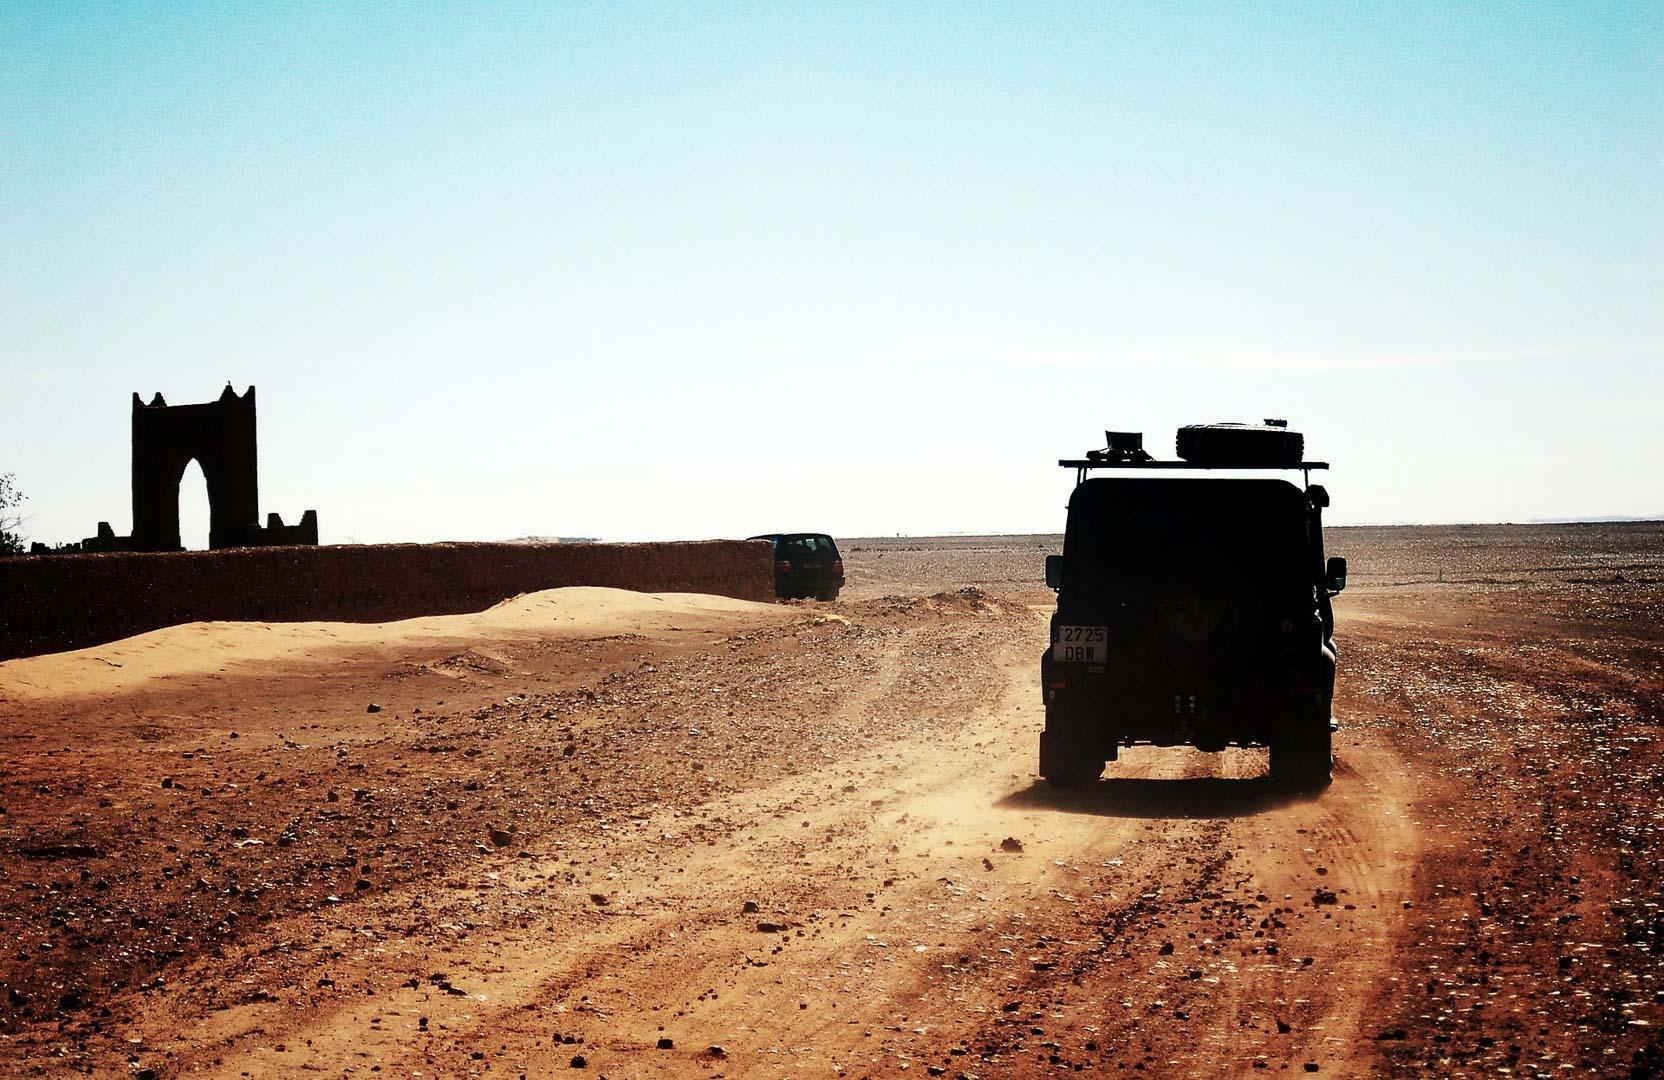 caravane chaima gmbh kameltrekking in marokko. Black Bedroom Furniture Sets. Home Design Ideas